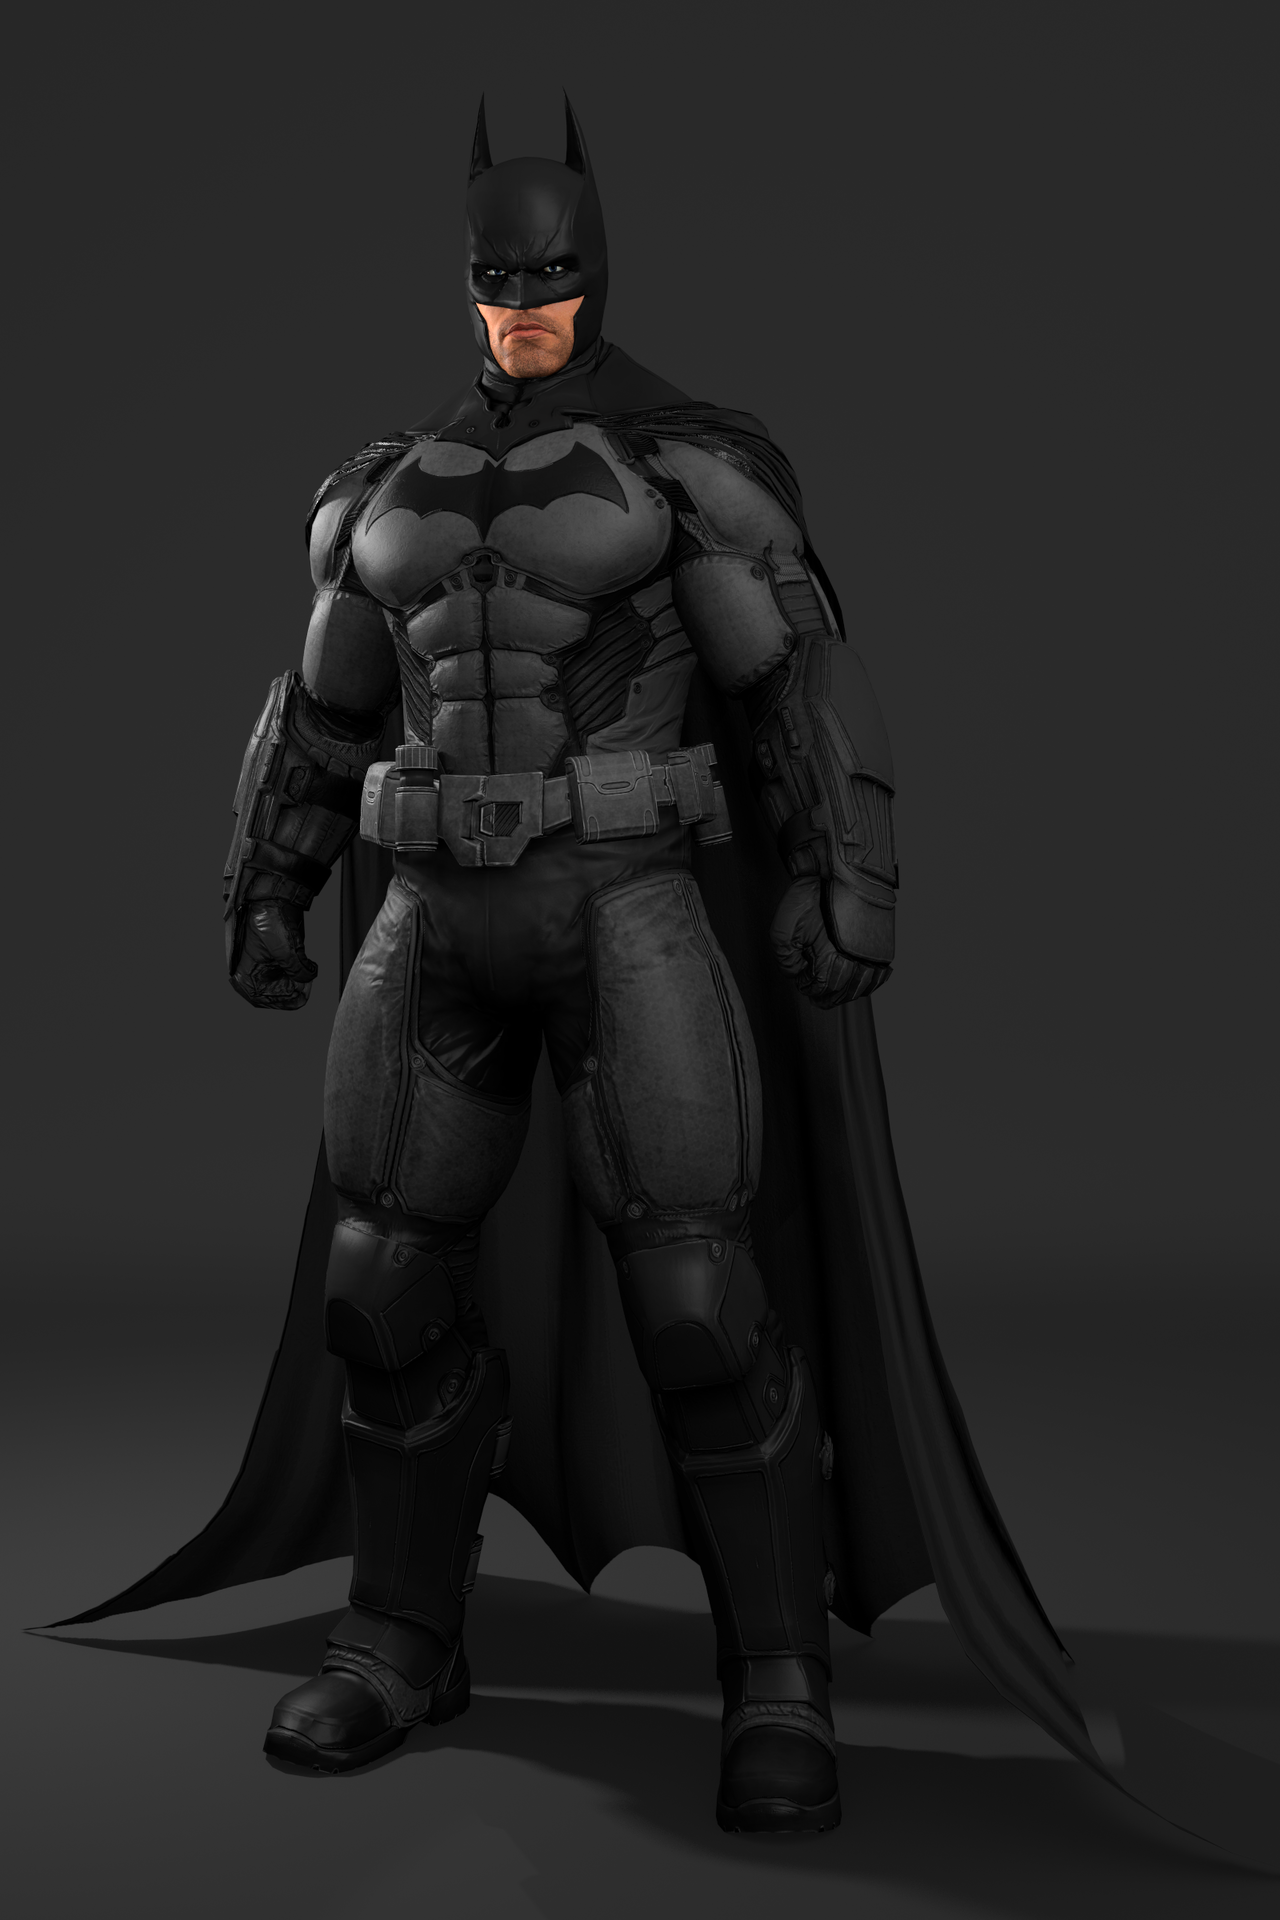 batman arkham origins online matchmaking Batman arkham origins online matchmaking hey all not sure if anyone remembers me, but i used t.